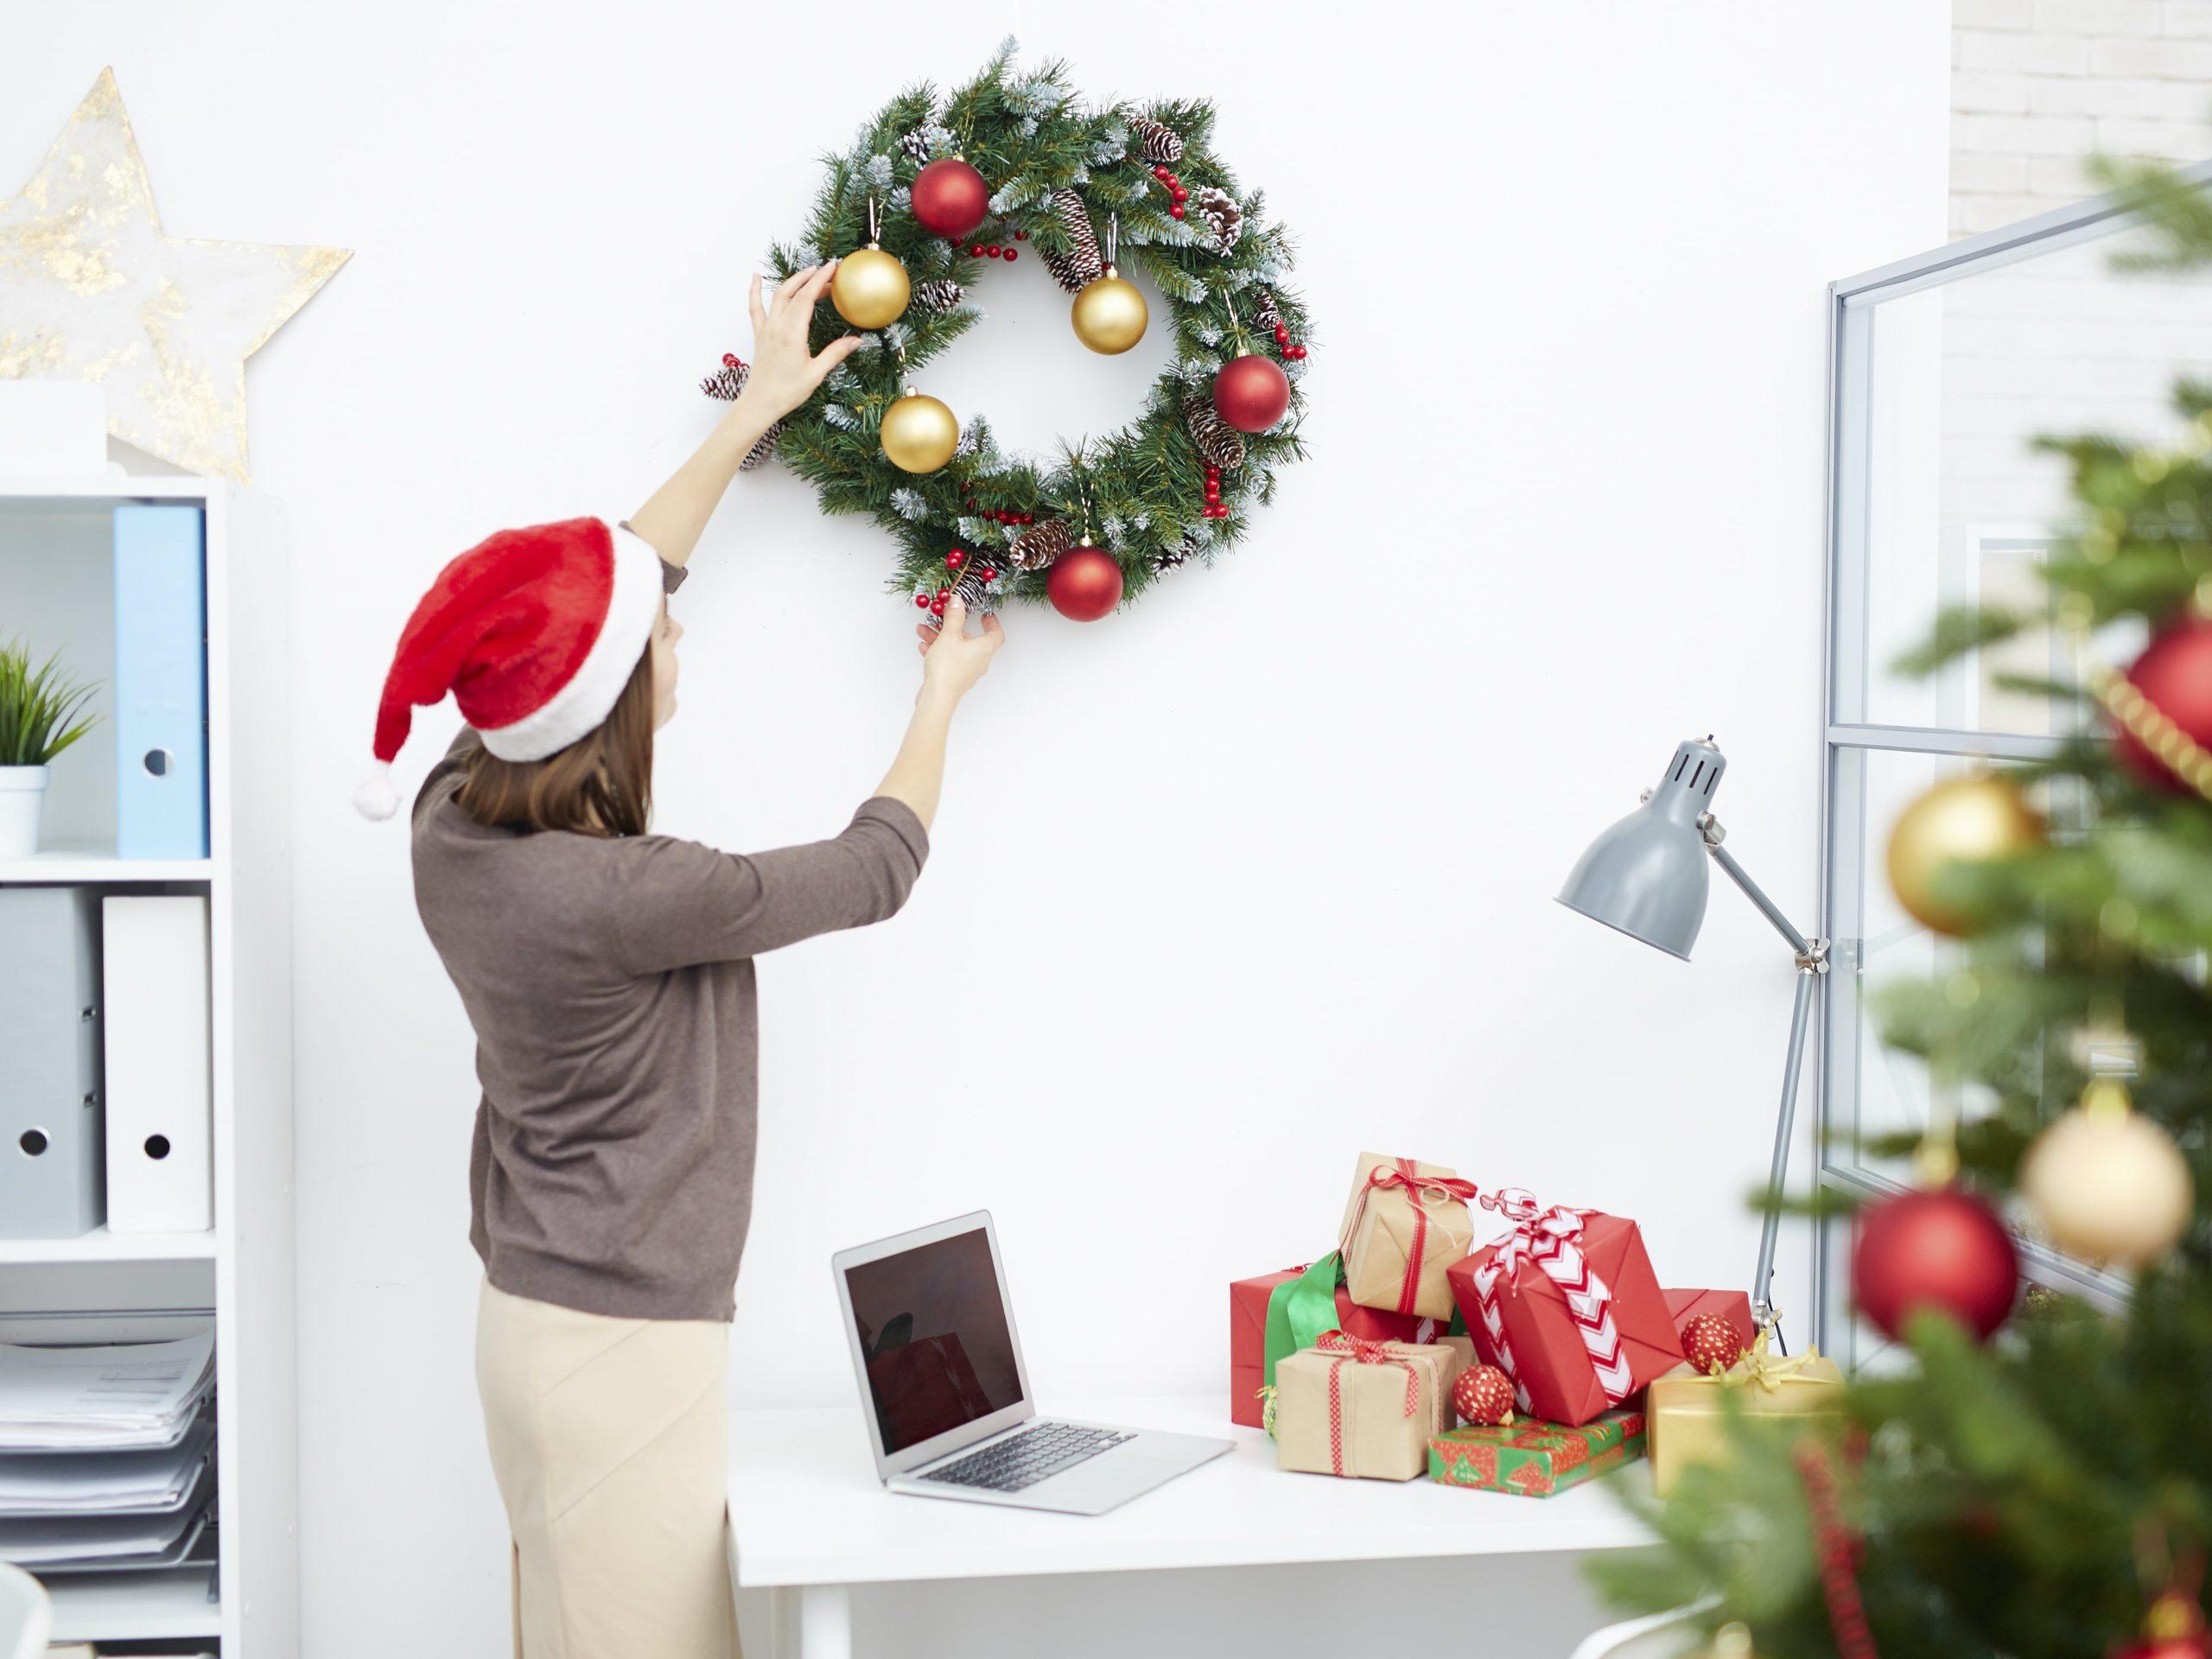 Treo vòng hoa trang trí Noel